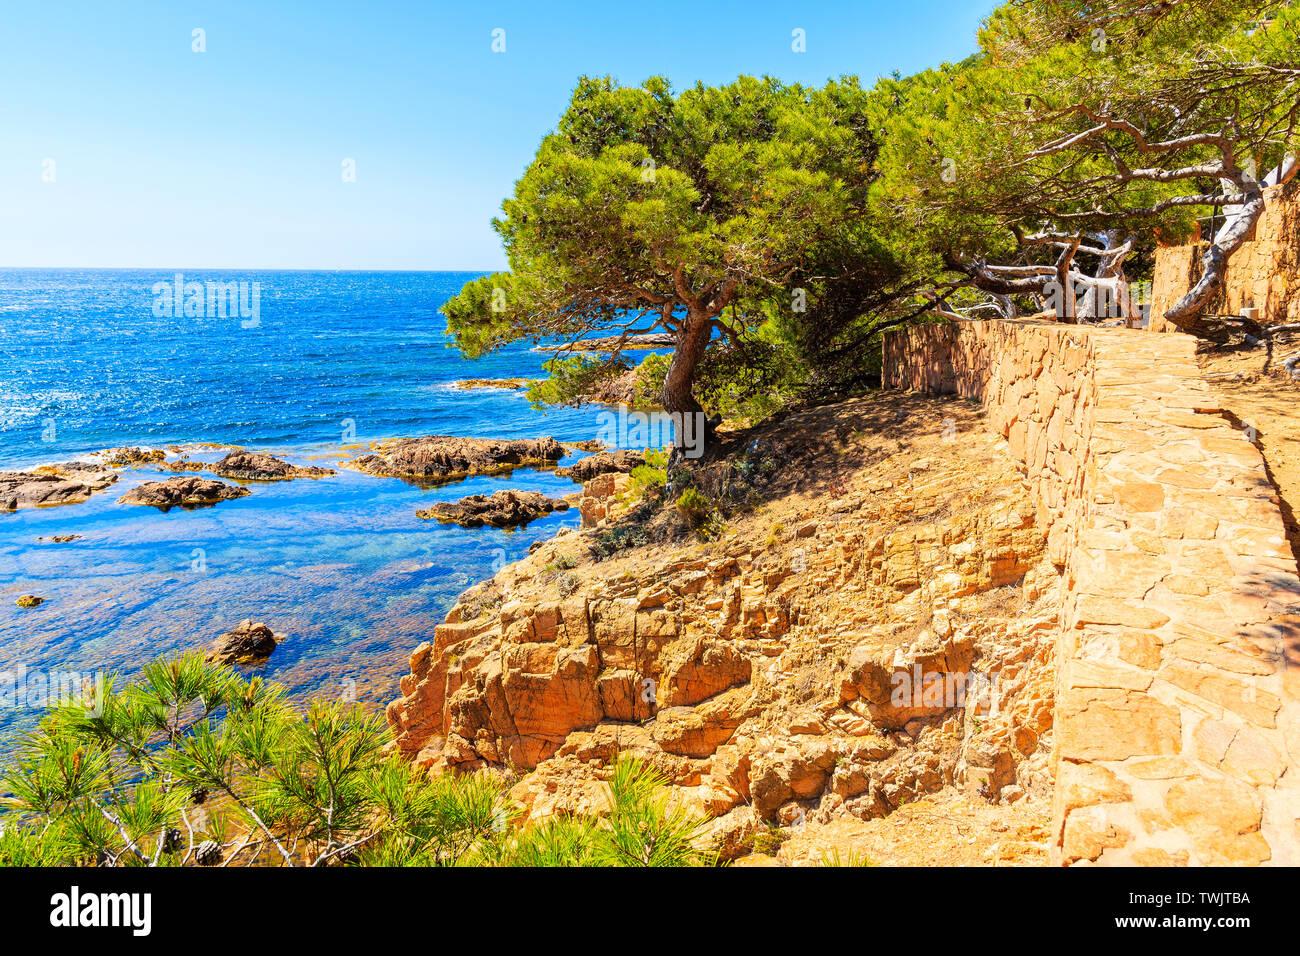 Trekking path along seacoast from Cala Aigua to Cala Marquesa, Costa Brava, Spain Stock Photo